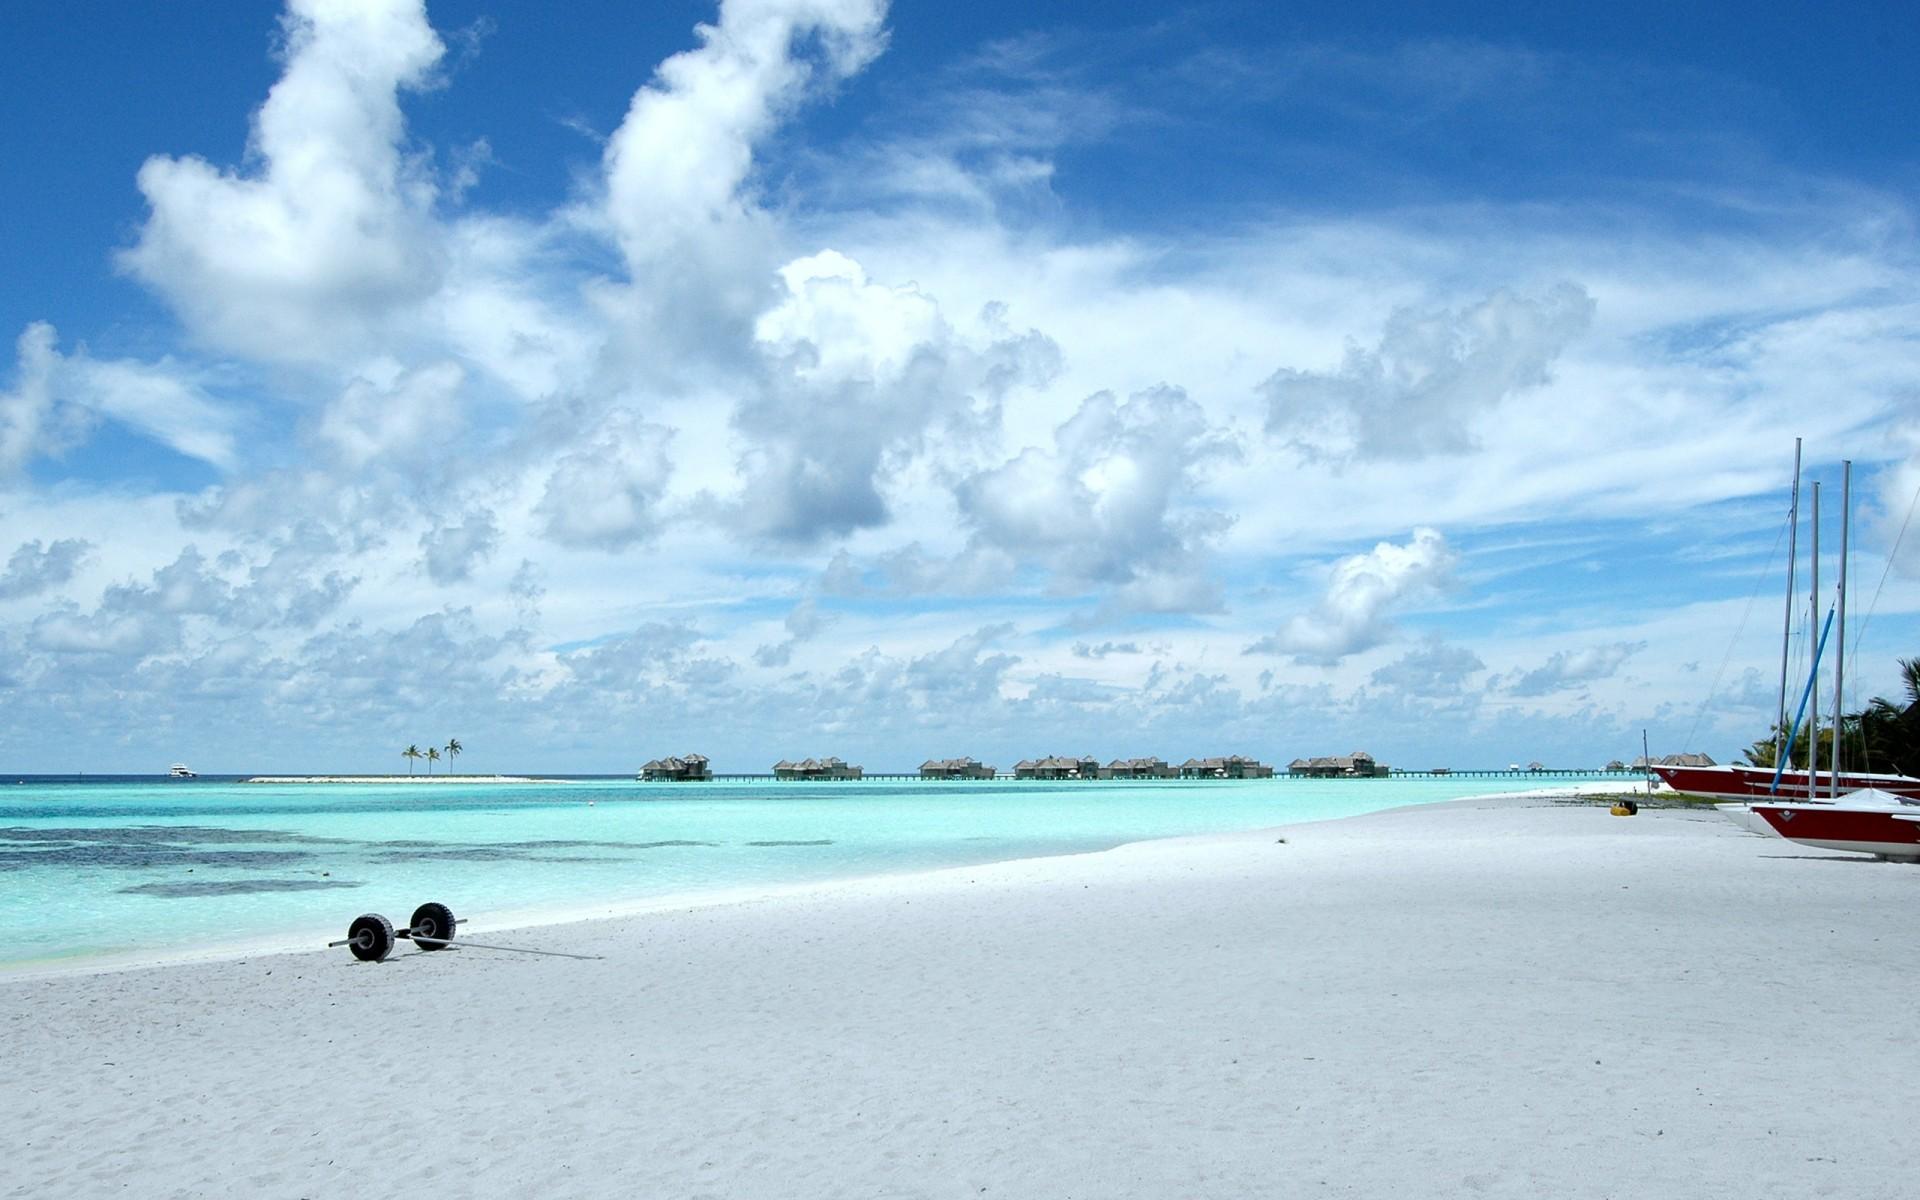 Картинки Пляж, Облака фото и обои на рабочий стол